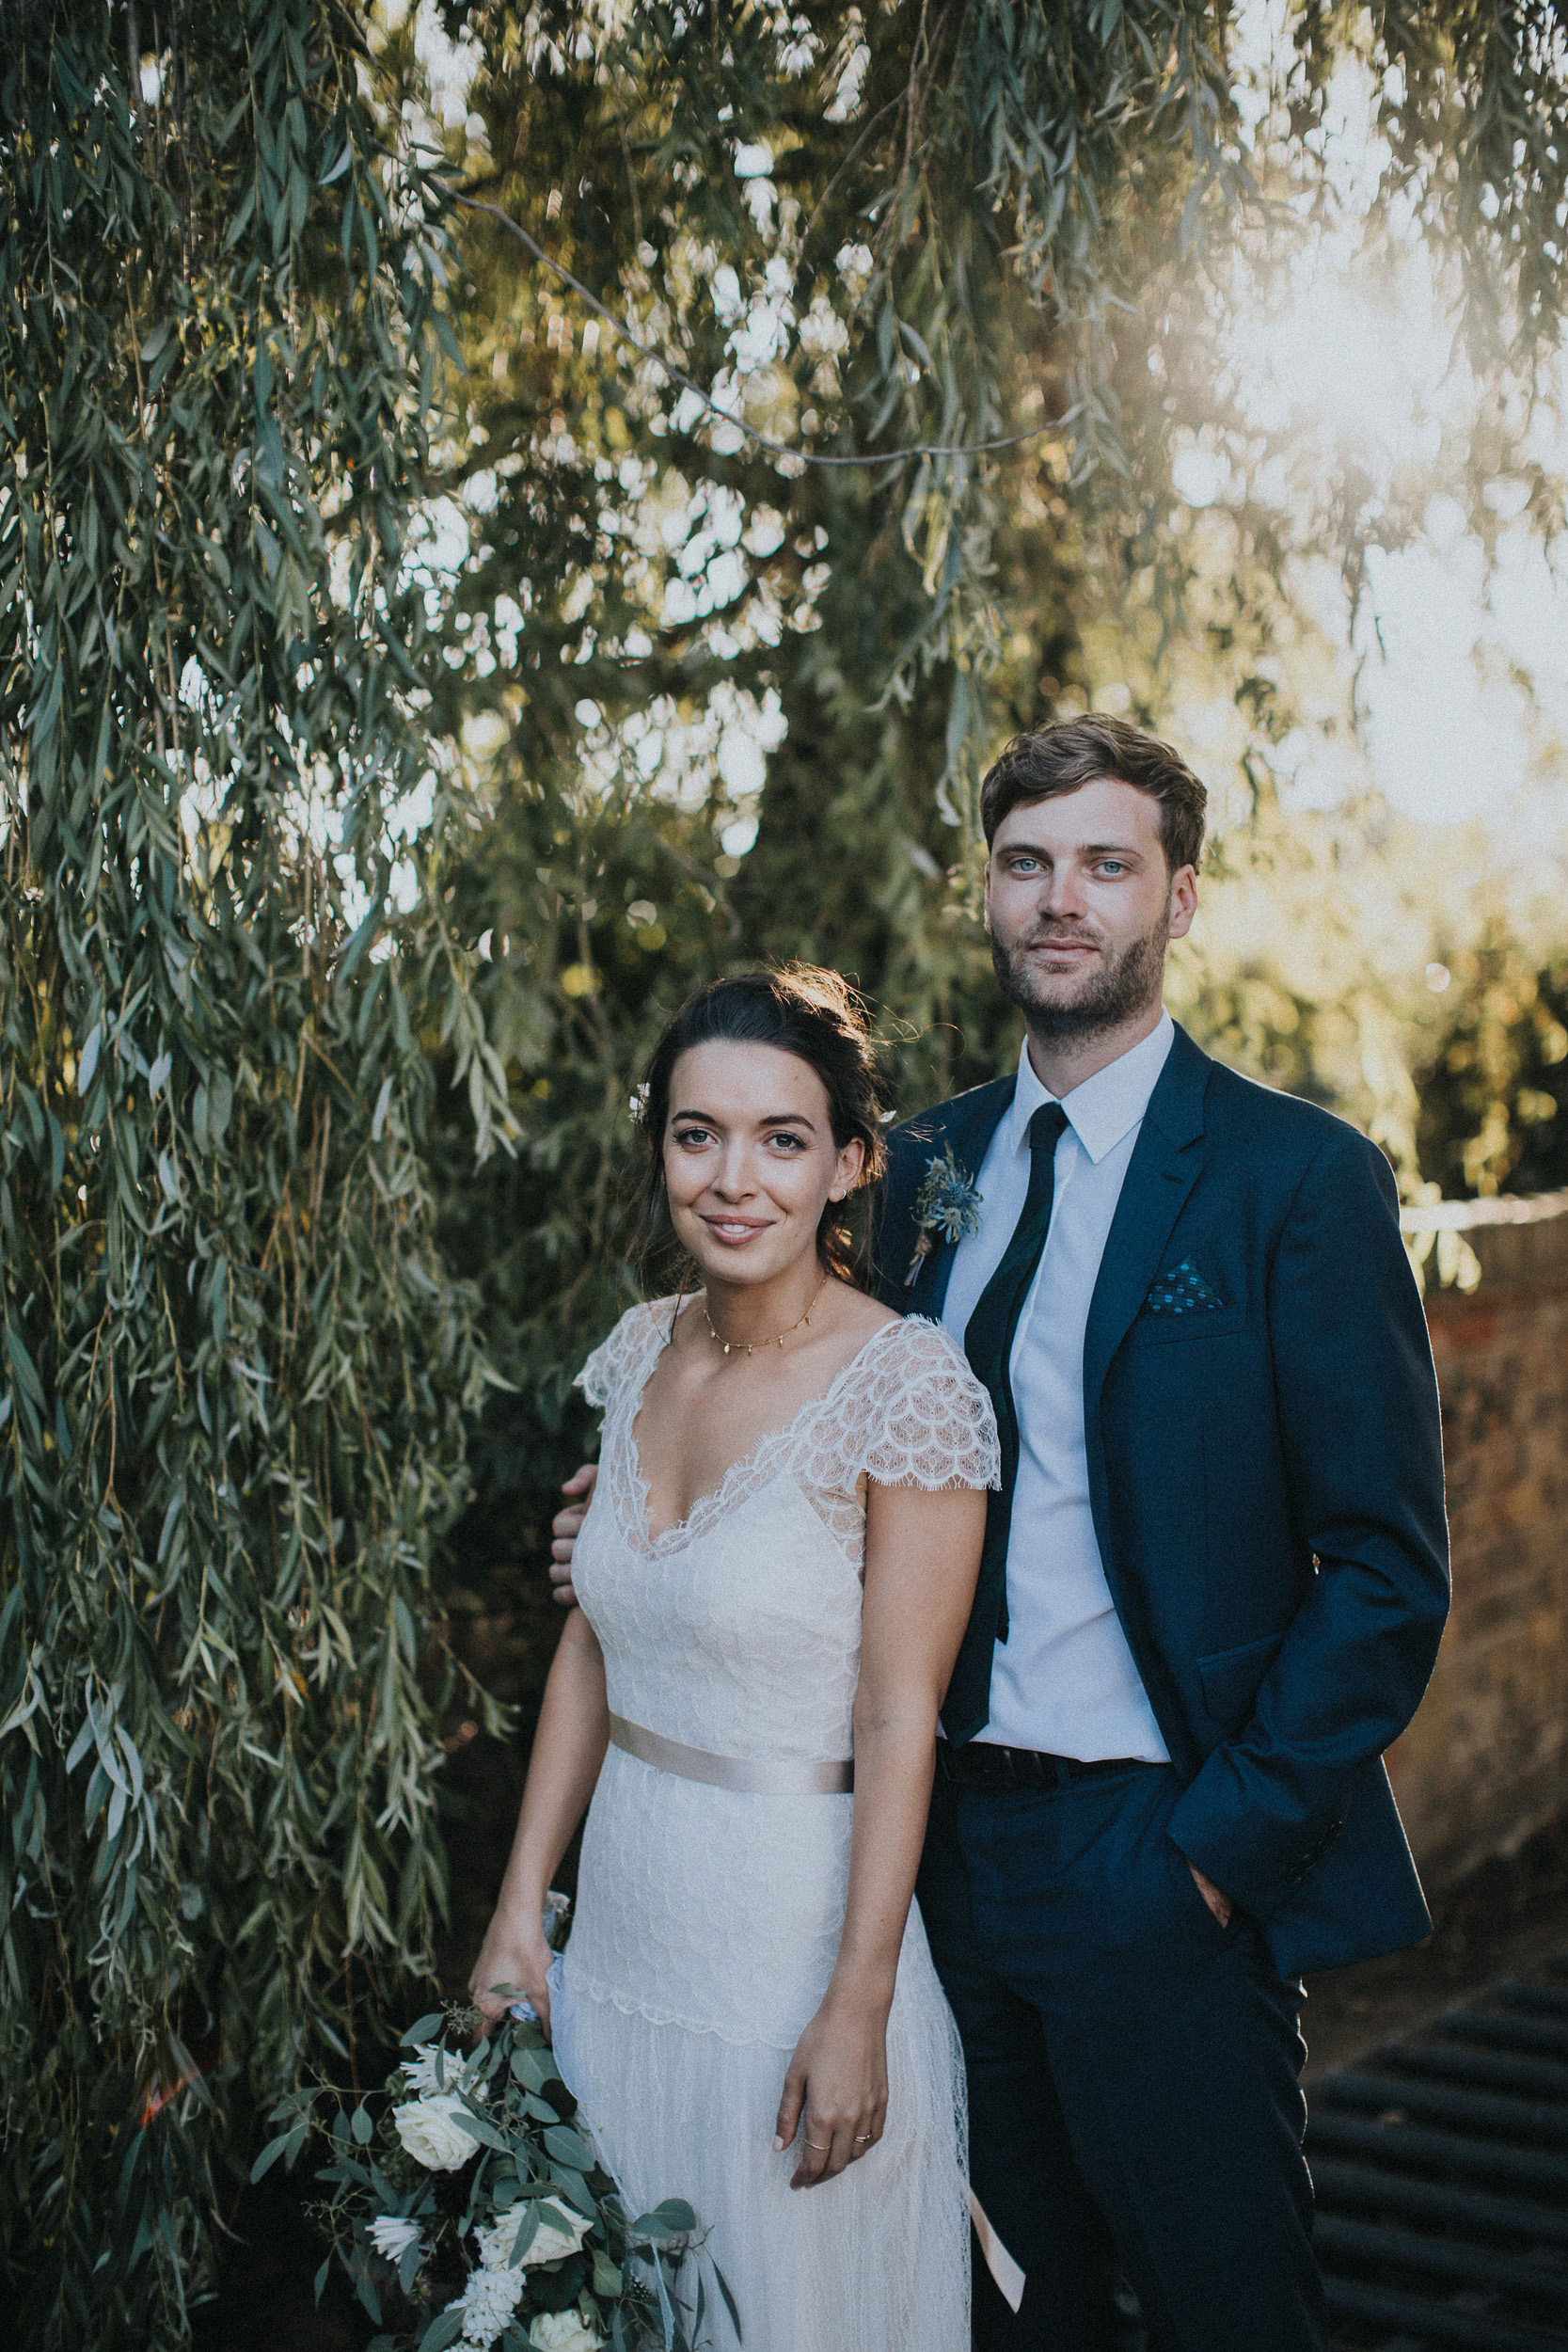 Martha-Laid-Back-Garden-Wedding-Lace-Wedding-Dress-Bohemian-Kate-Beaumont-48.jpg